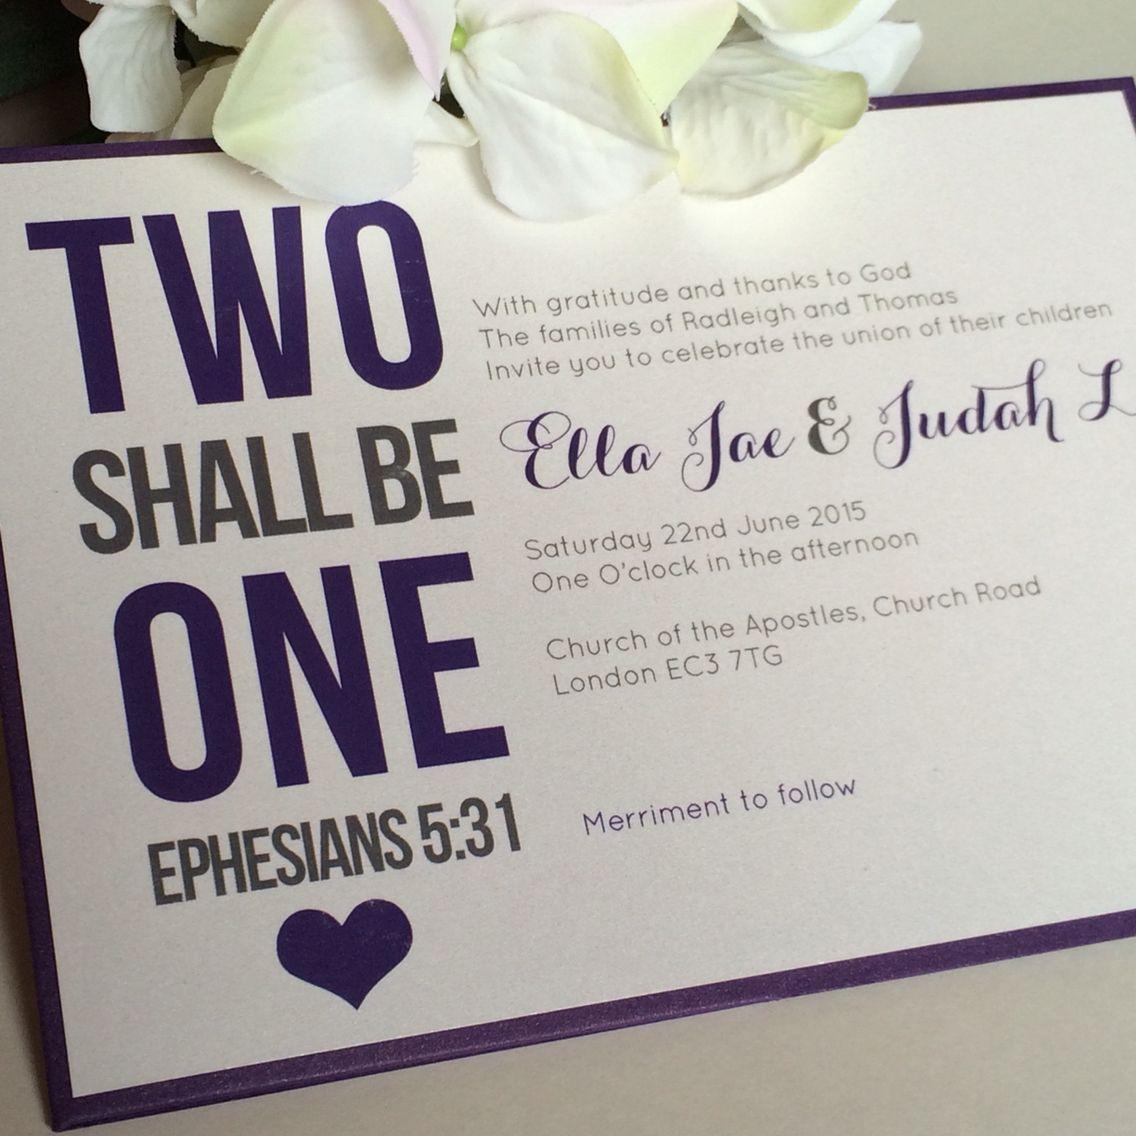 Two Shall Be One Christian Wedding Invitations Weddinginvitations Christianwedding: Thanks Wedding Invitation Ideas At Websimilar.org